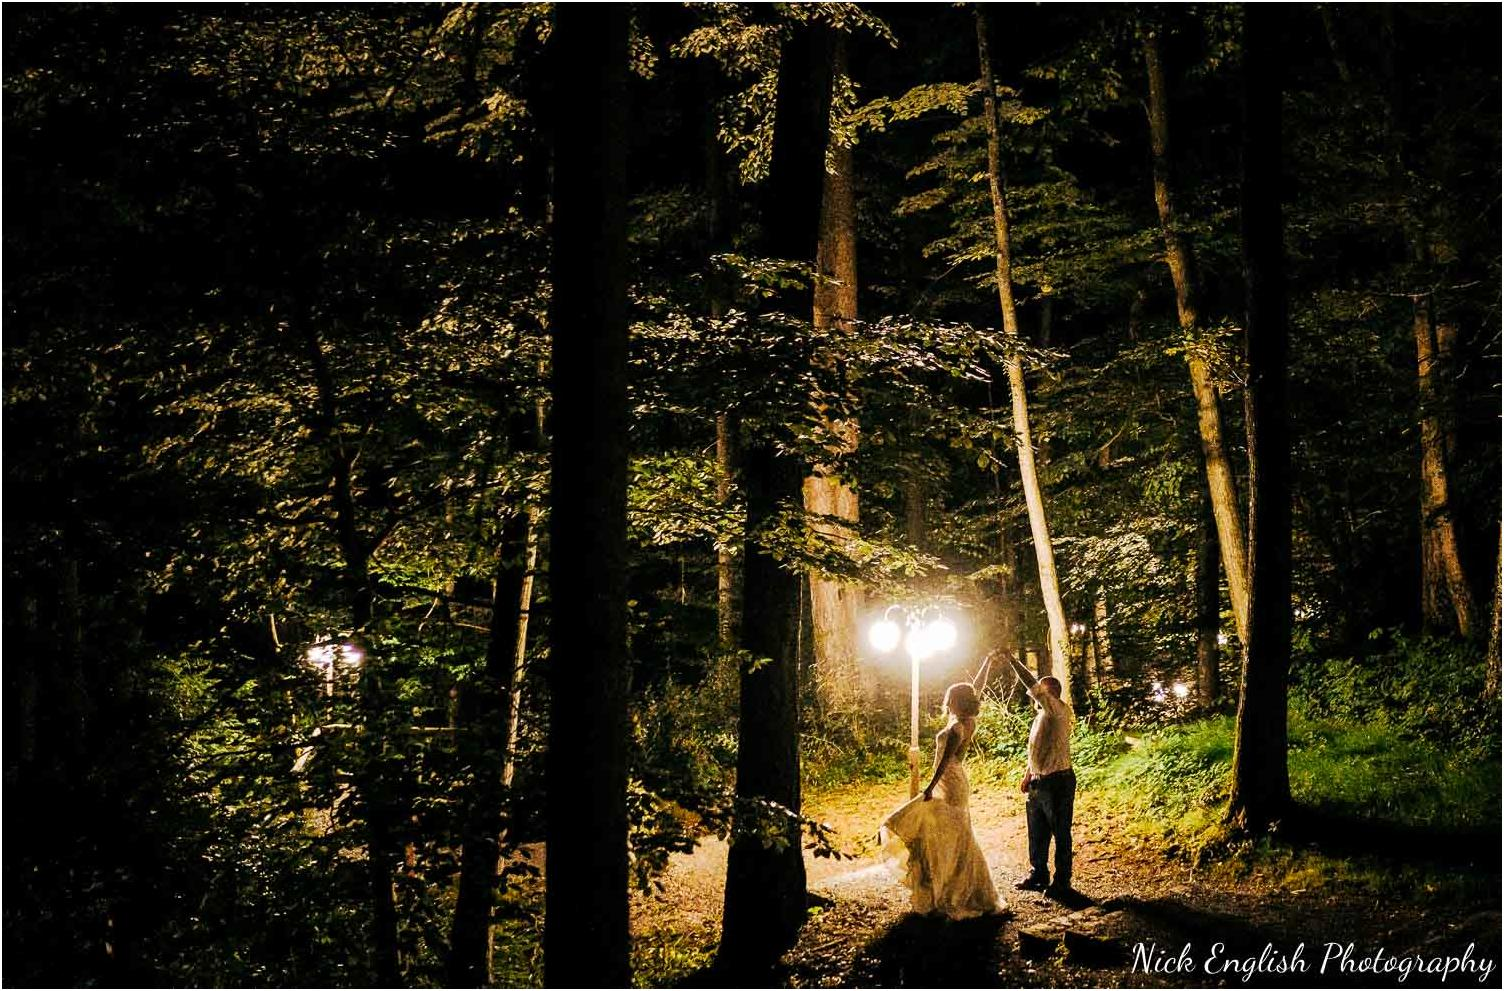 Destination_Wedding_Photographer_Slovenia_Nick_English_Photography-95.jpg